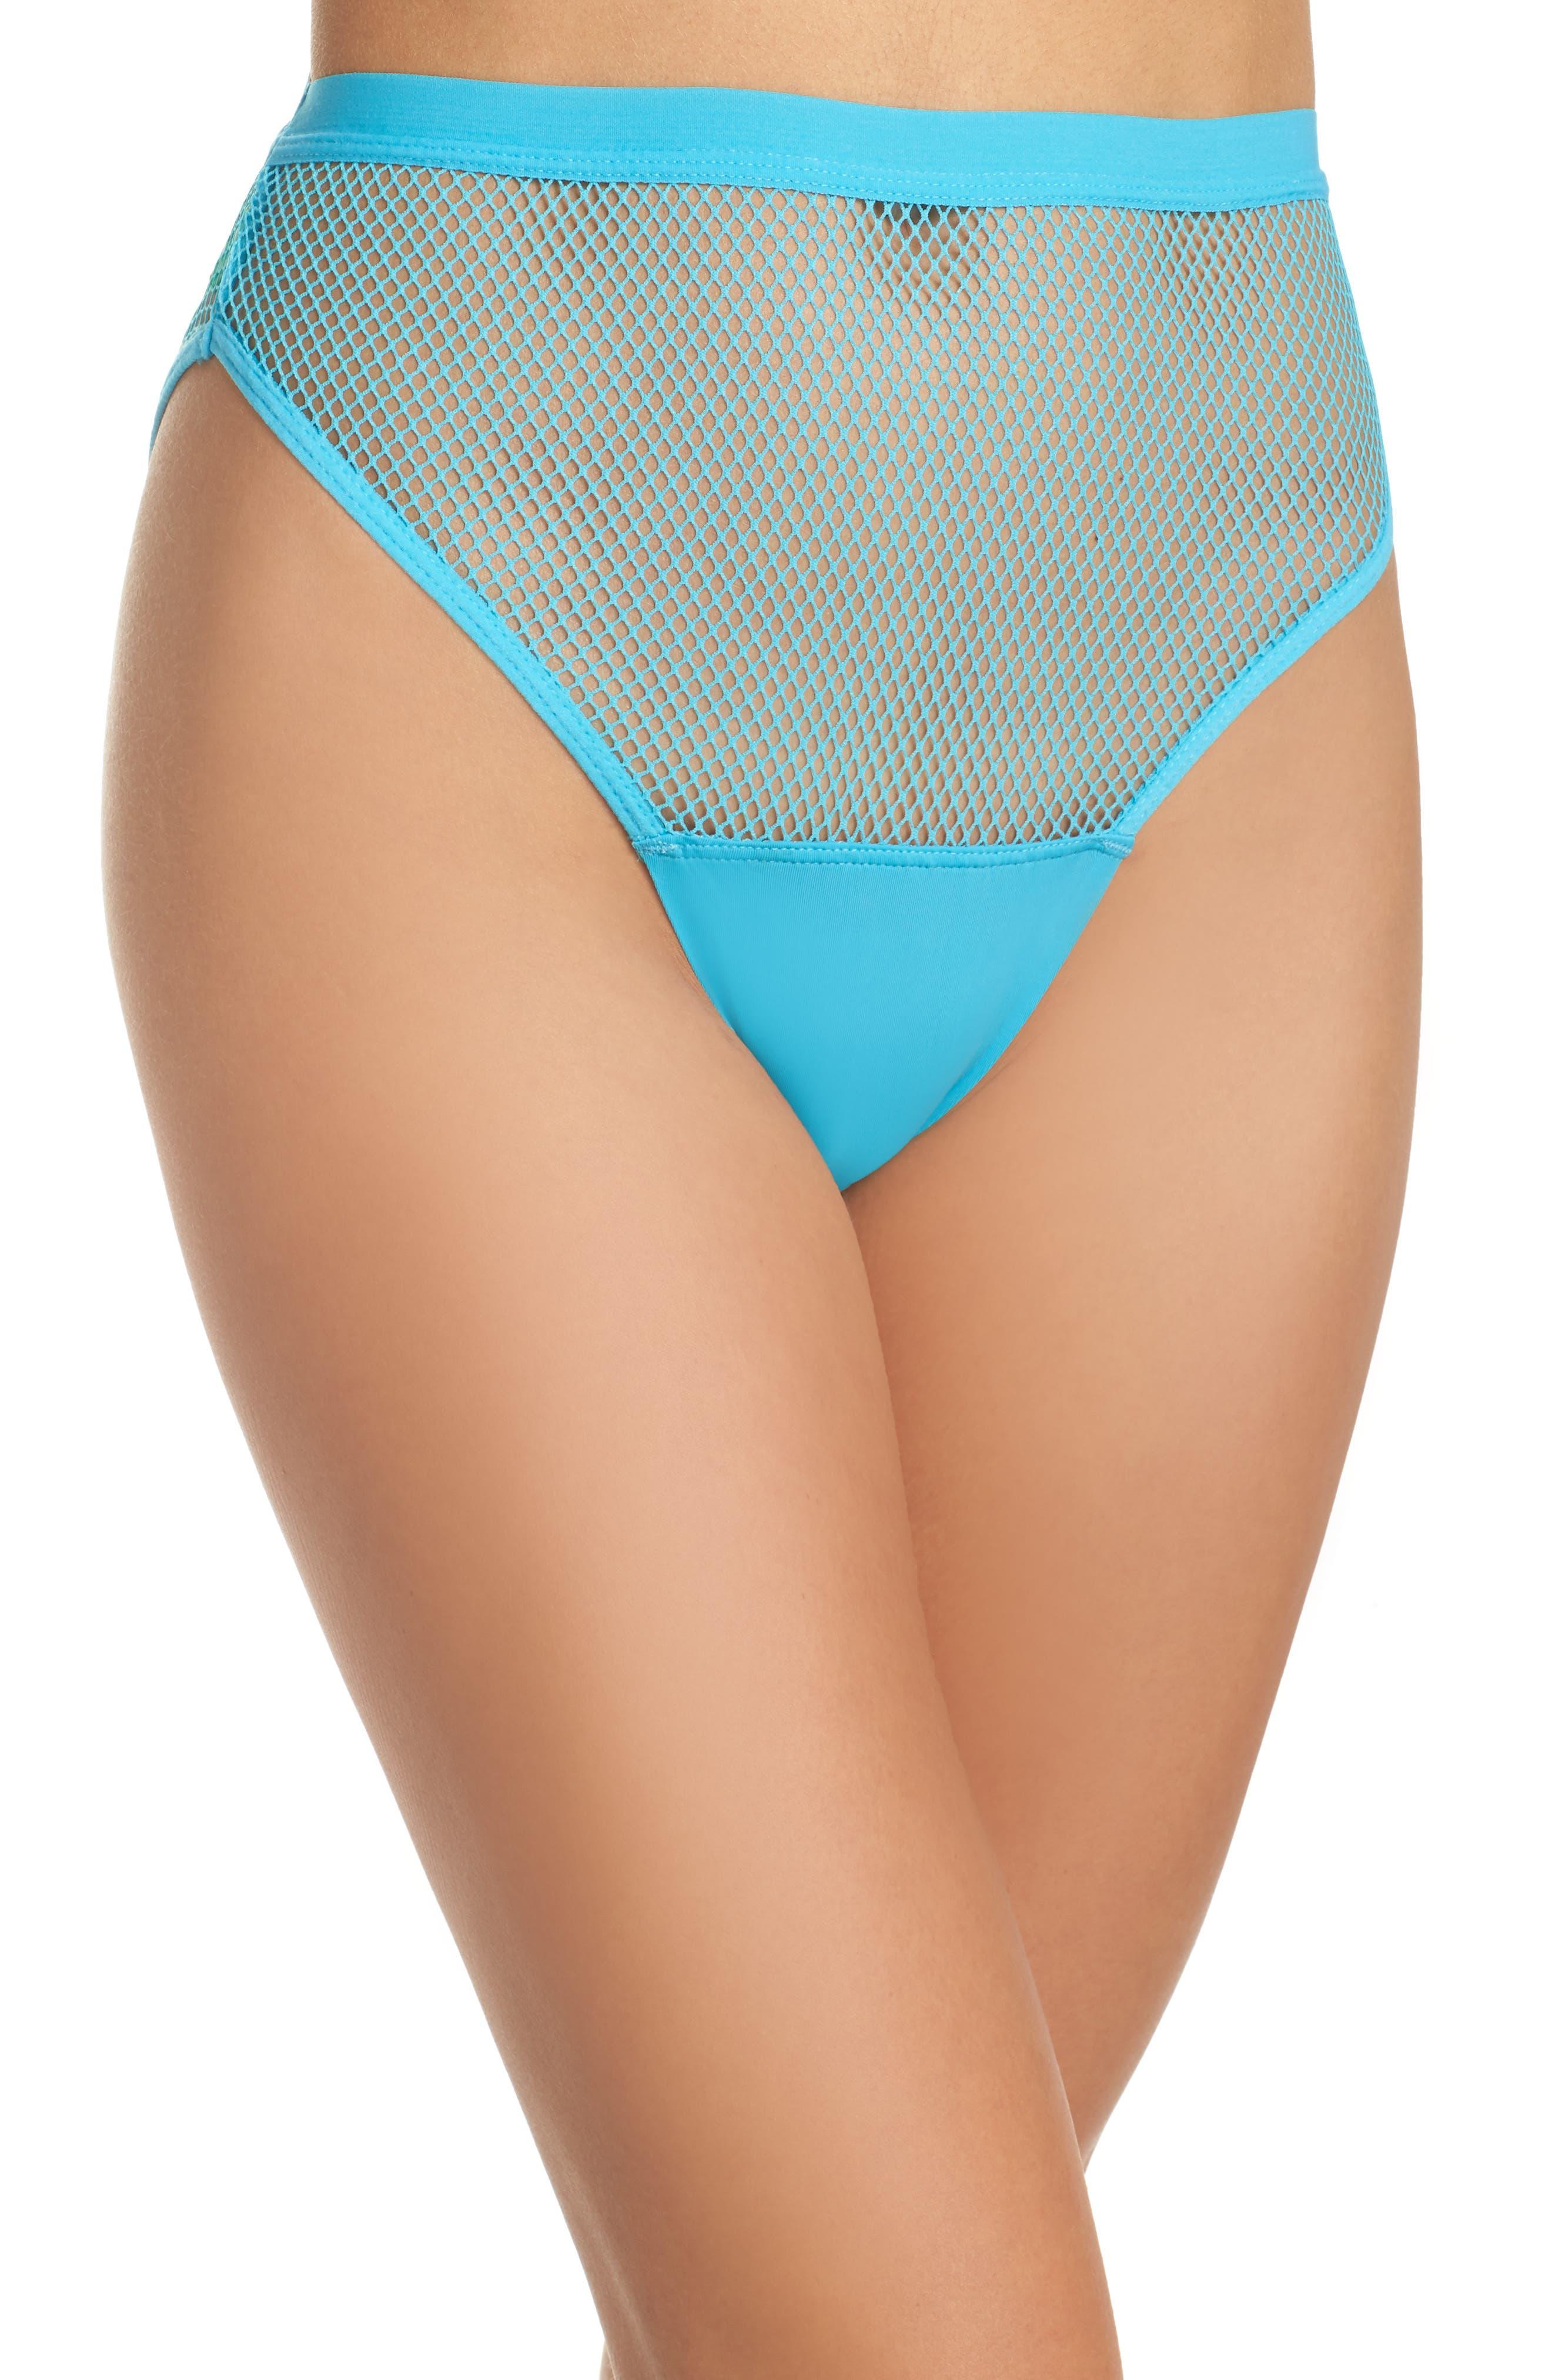 Honeydew High Waist Fishnet Panties,                         Main,                         color, Sea Breezer